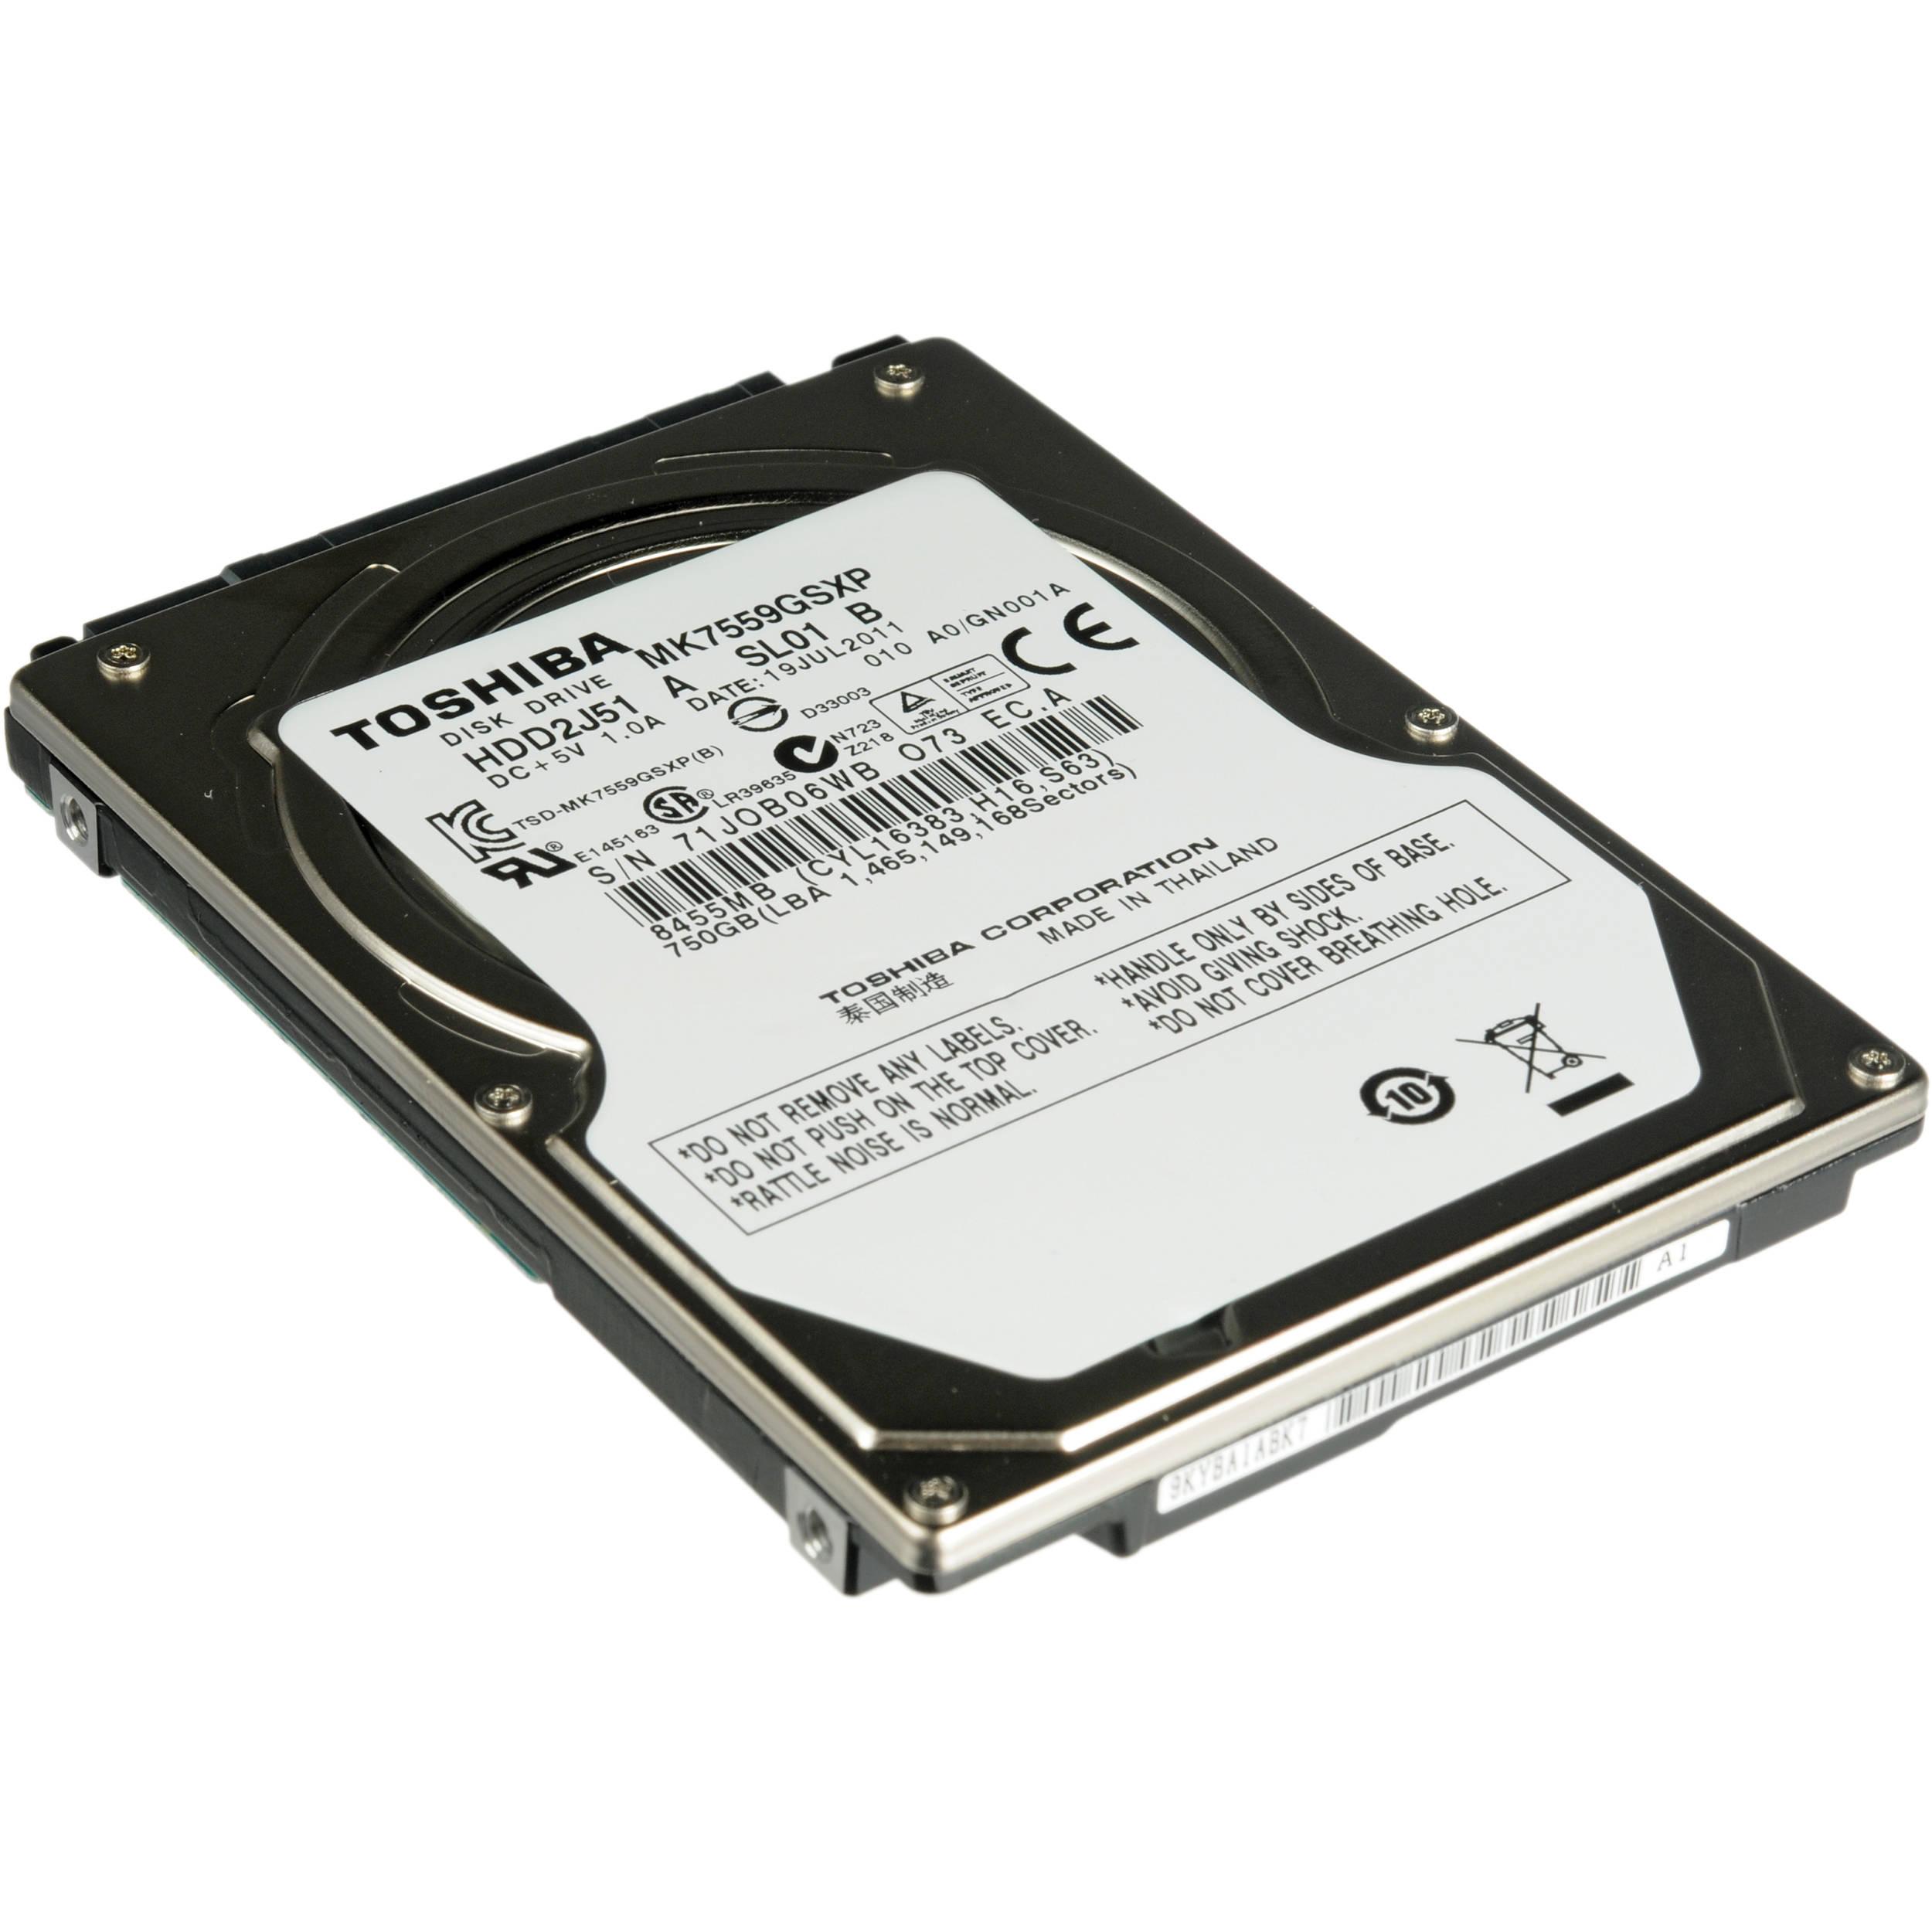 "Toshiba 750GB MK7559GSXP 2.5"" Hard Disk Drive MK7559GSXP"